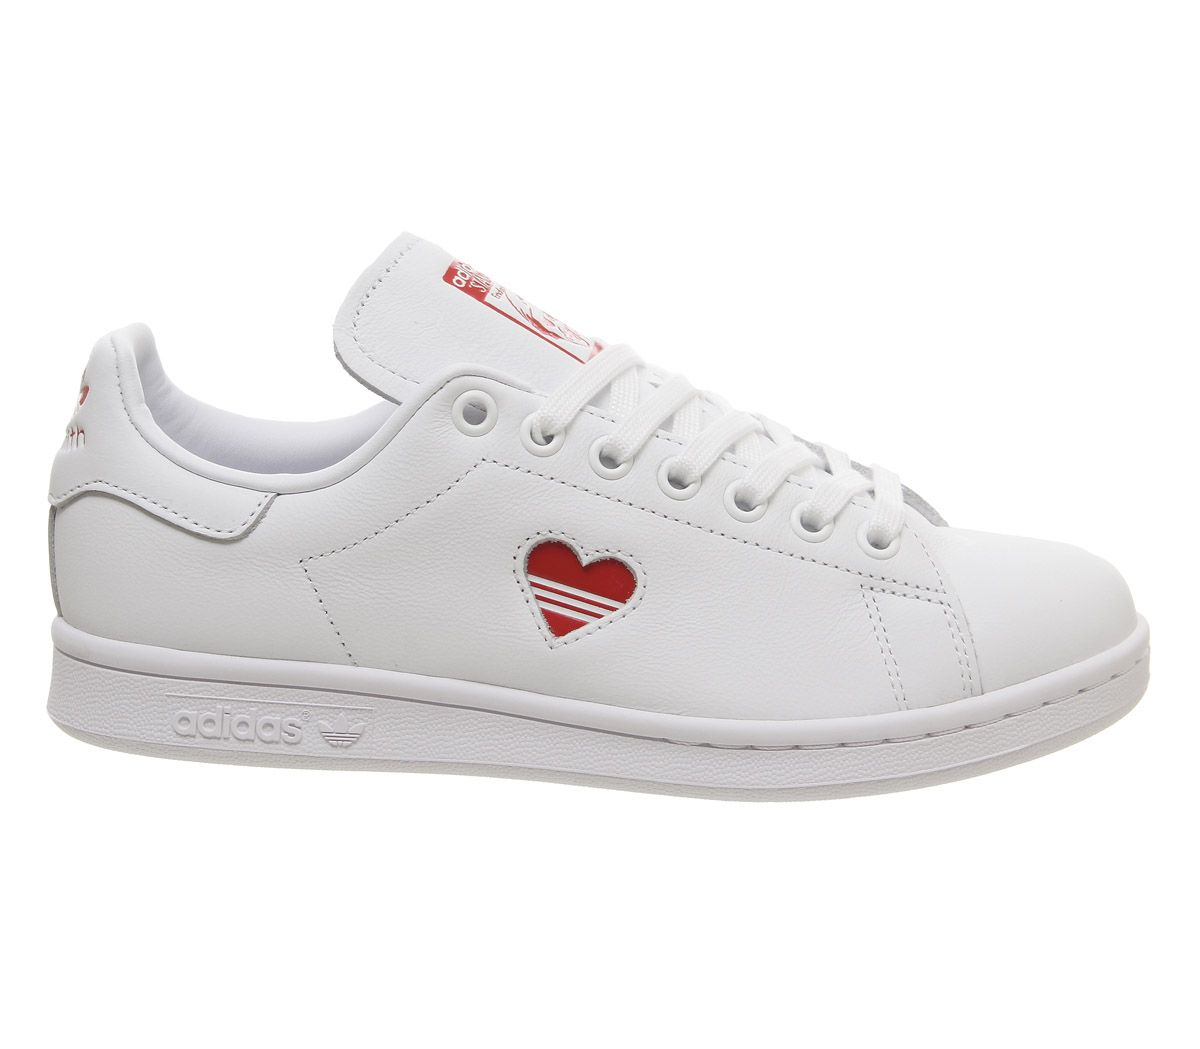 outlet store e68a3 90b5b Donna-Adidas-Stan-Smith-Scarpe-da-Ginnastica-Bianche-